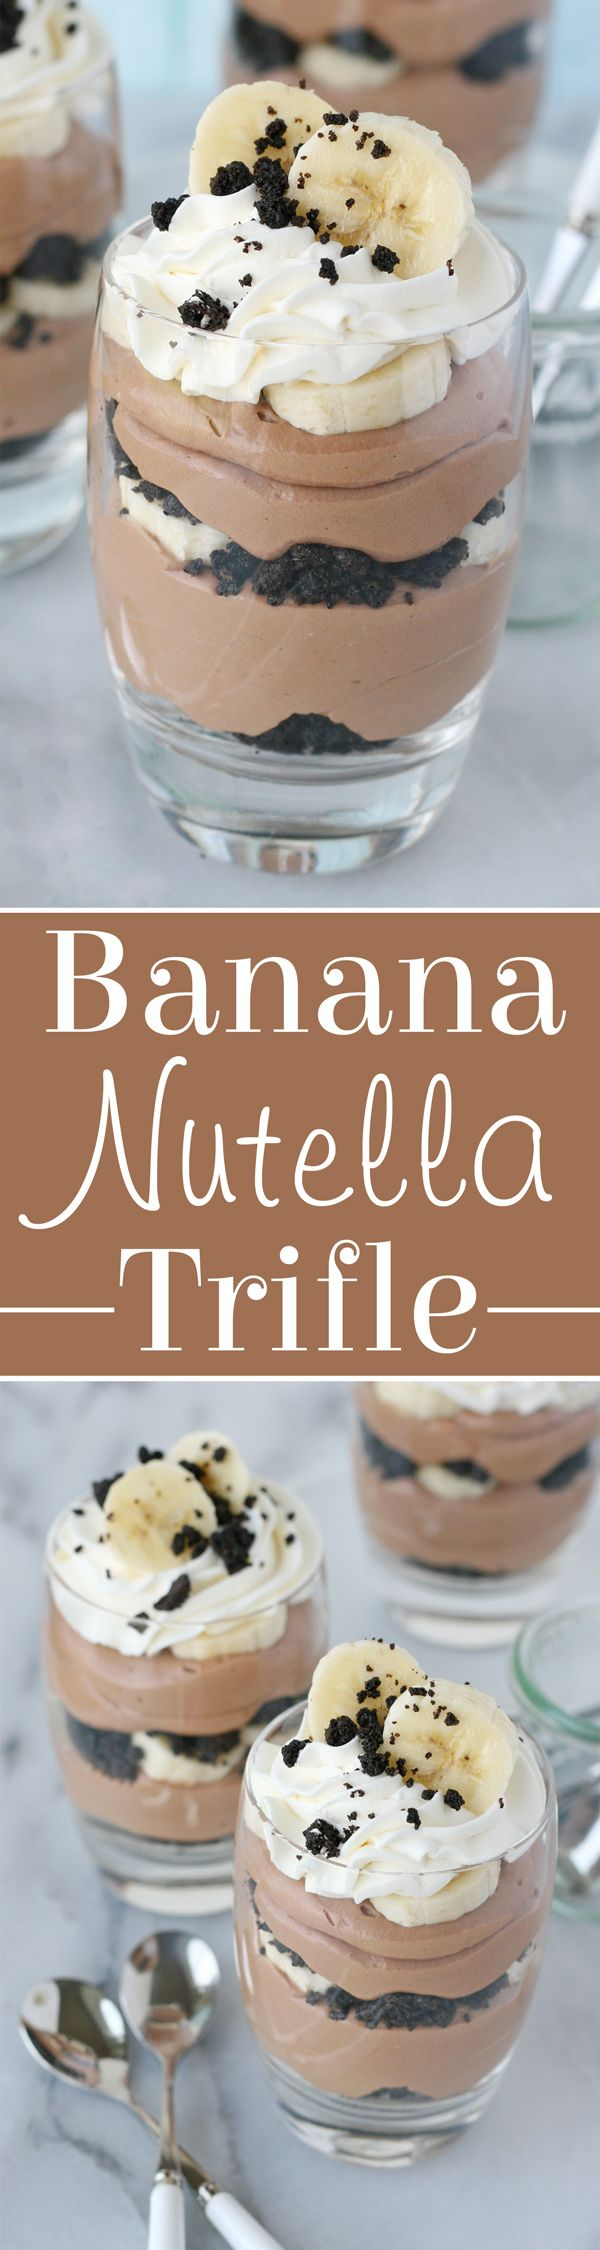 Simply INCREDIBLE! Bananas, Nutella, Whipped Cream, Oreos... YUM!